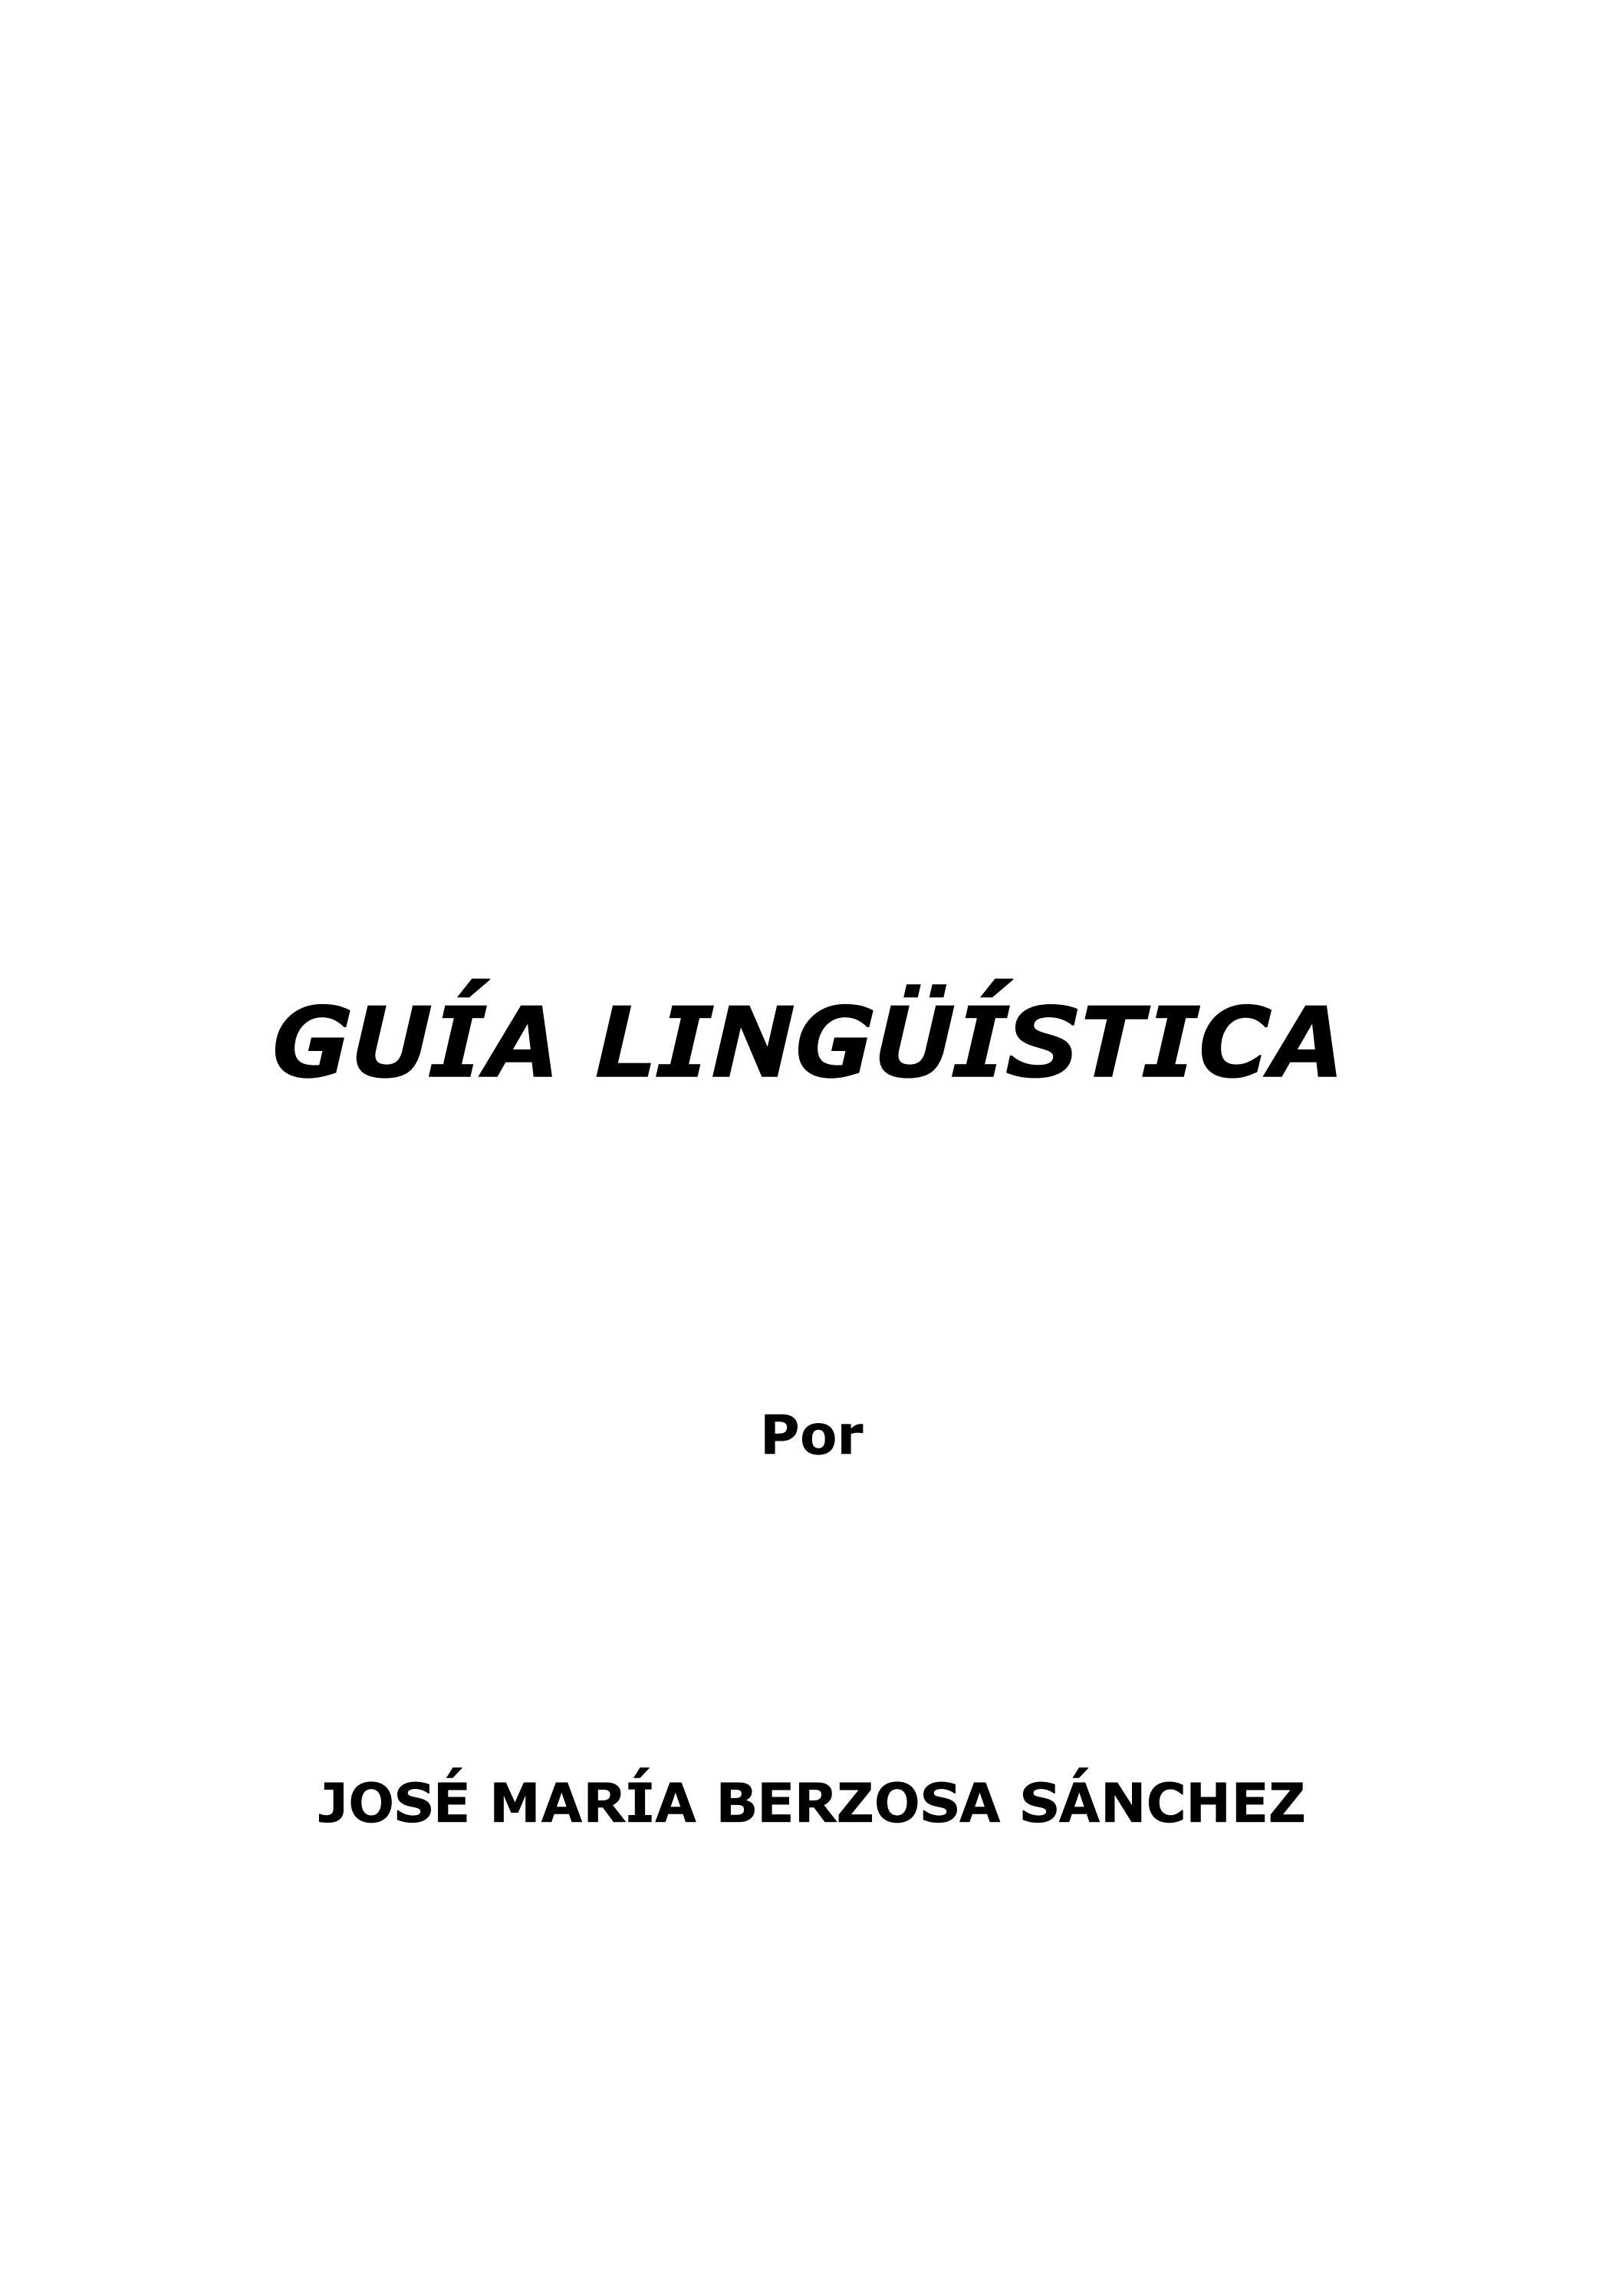 By Issuu Lingüística Pepe Guía Aranda 2WIeEH9DY